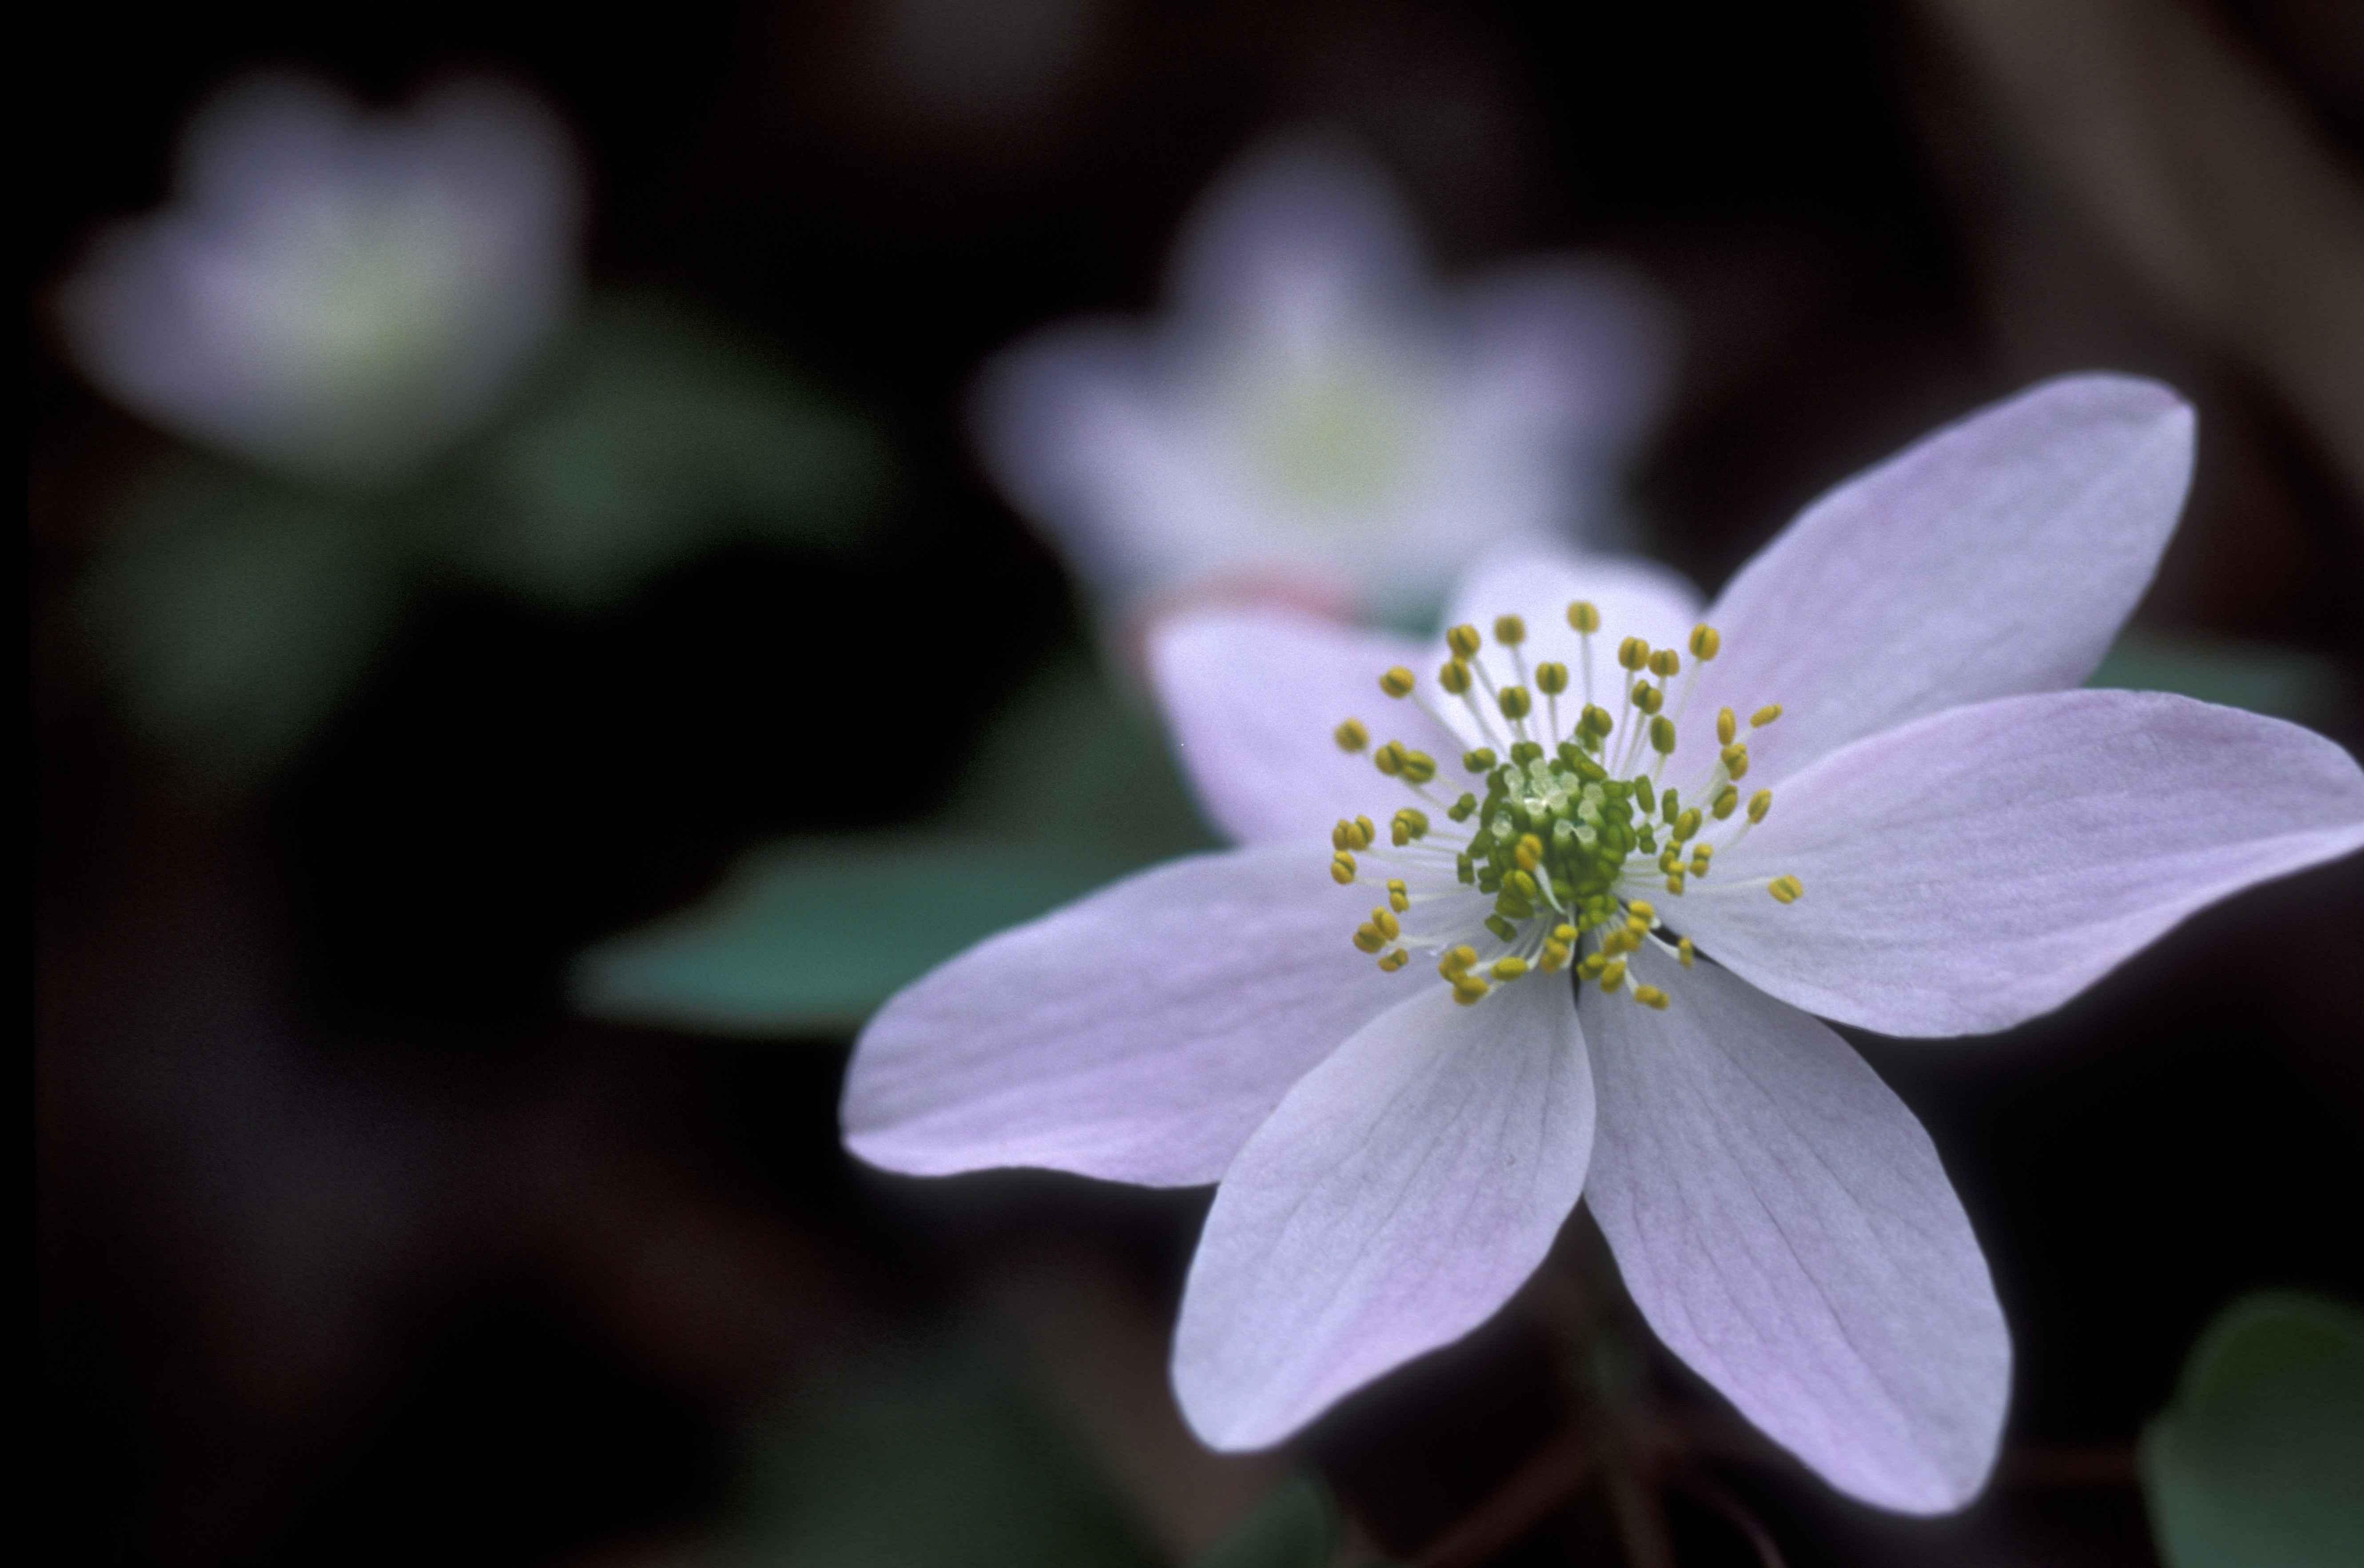 Filewhite flower petals of a rue anemoneg wikimedia commons filewhite flower petals of a rue anemoneg mightylinksfo